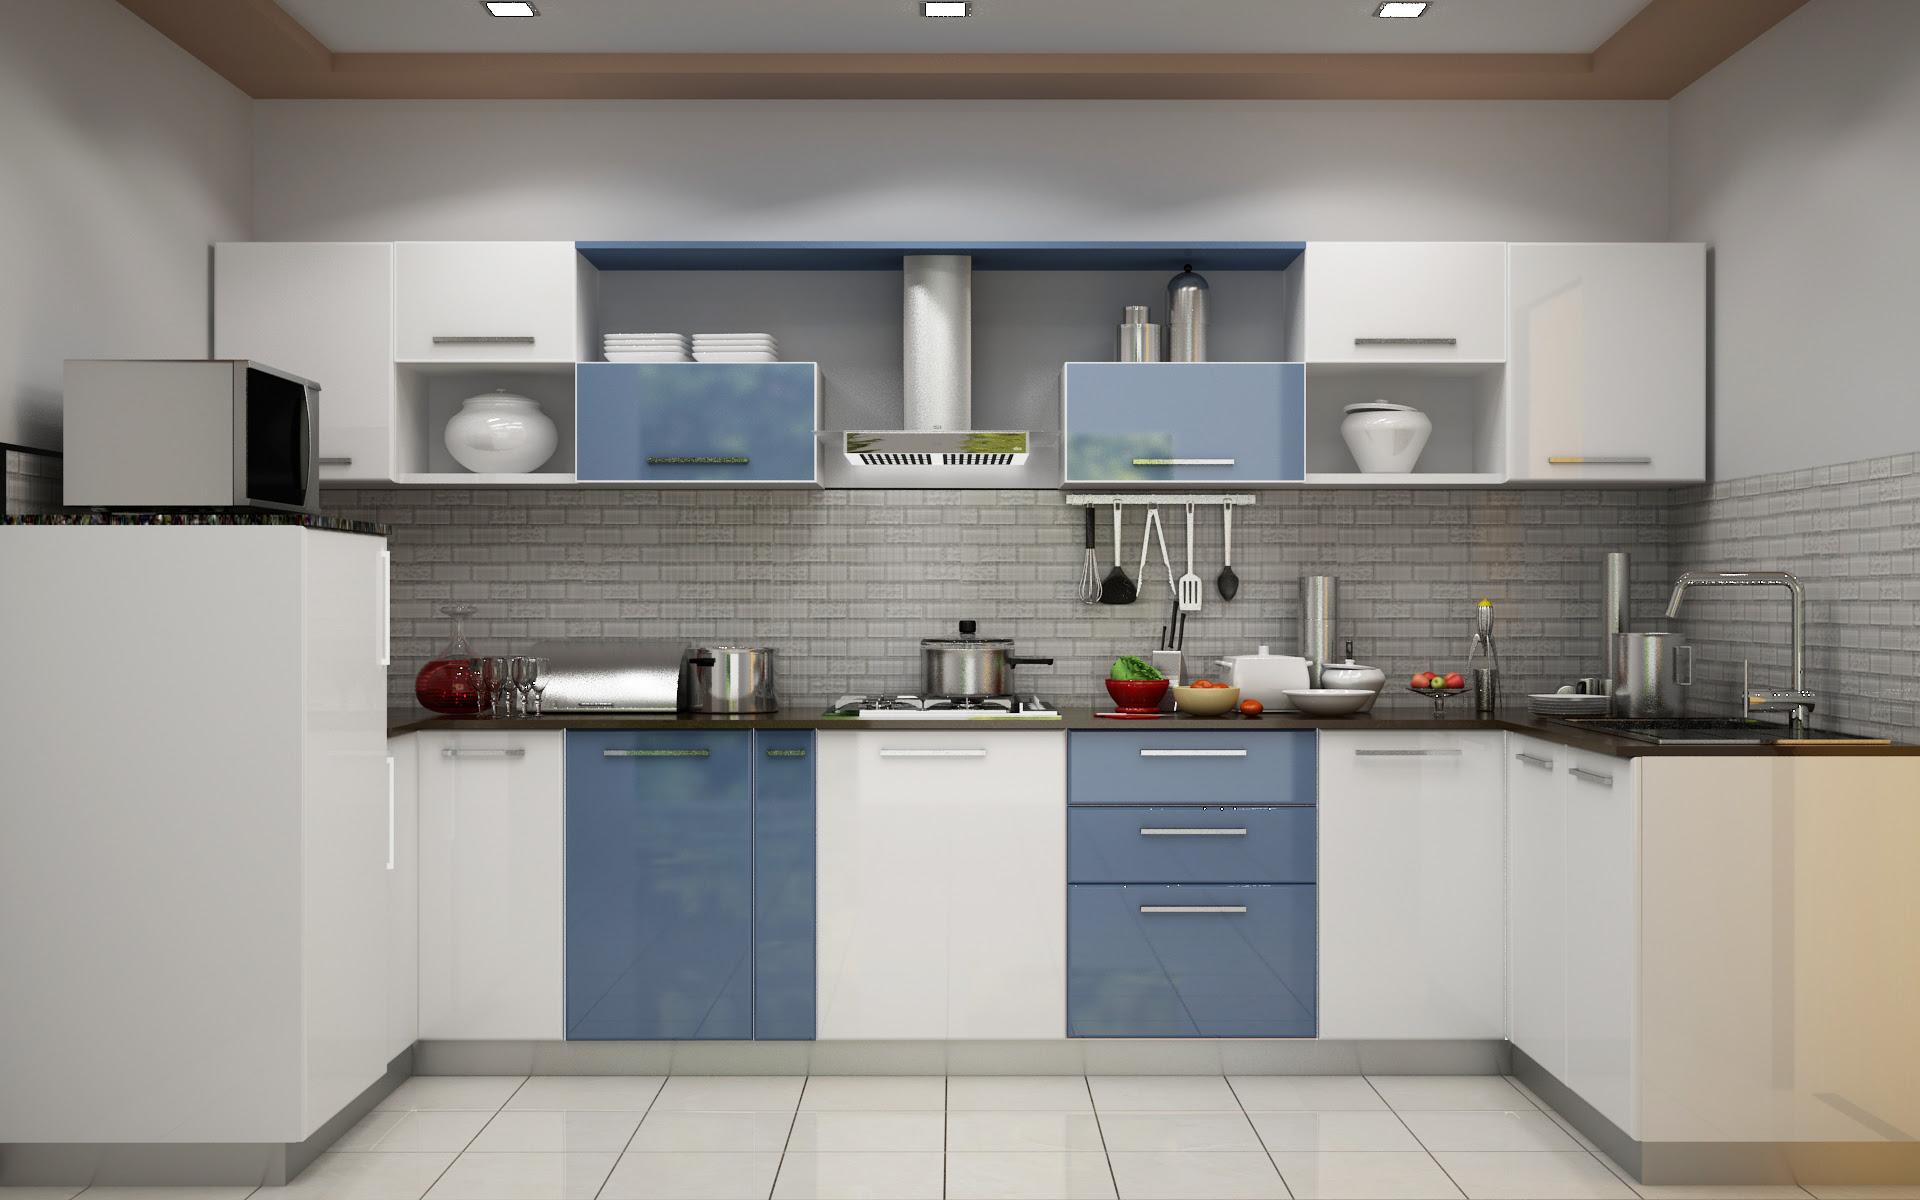 Best Modular Kitchen Designs in Bangalore | Customised ...